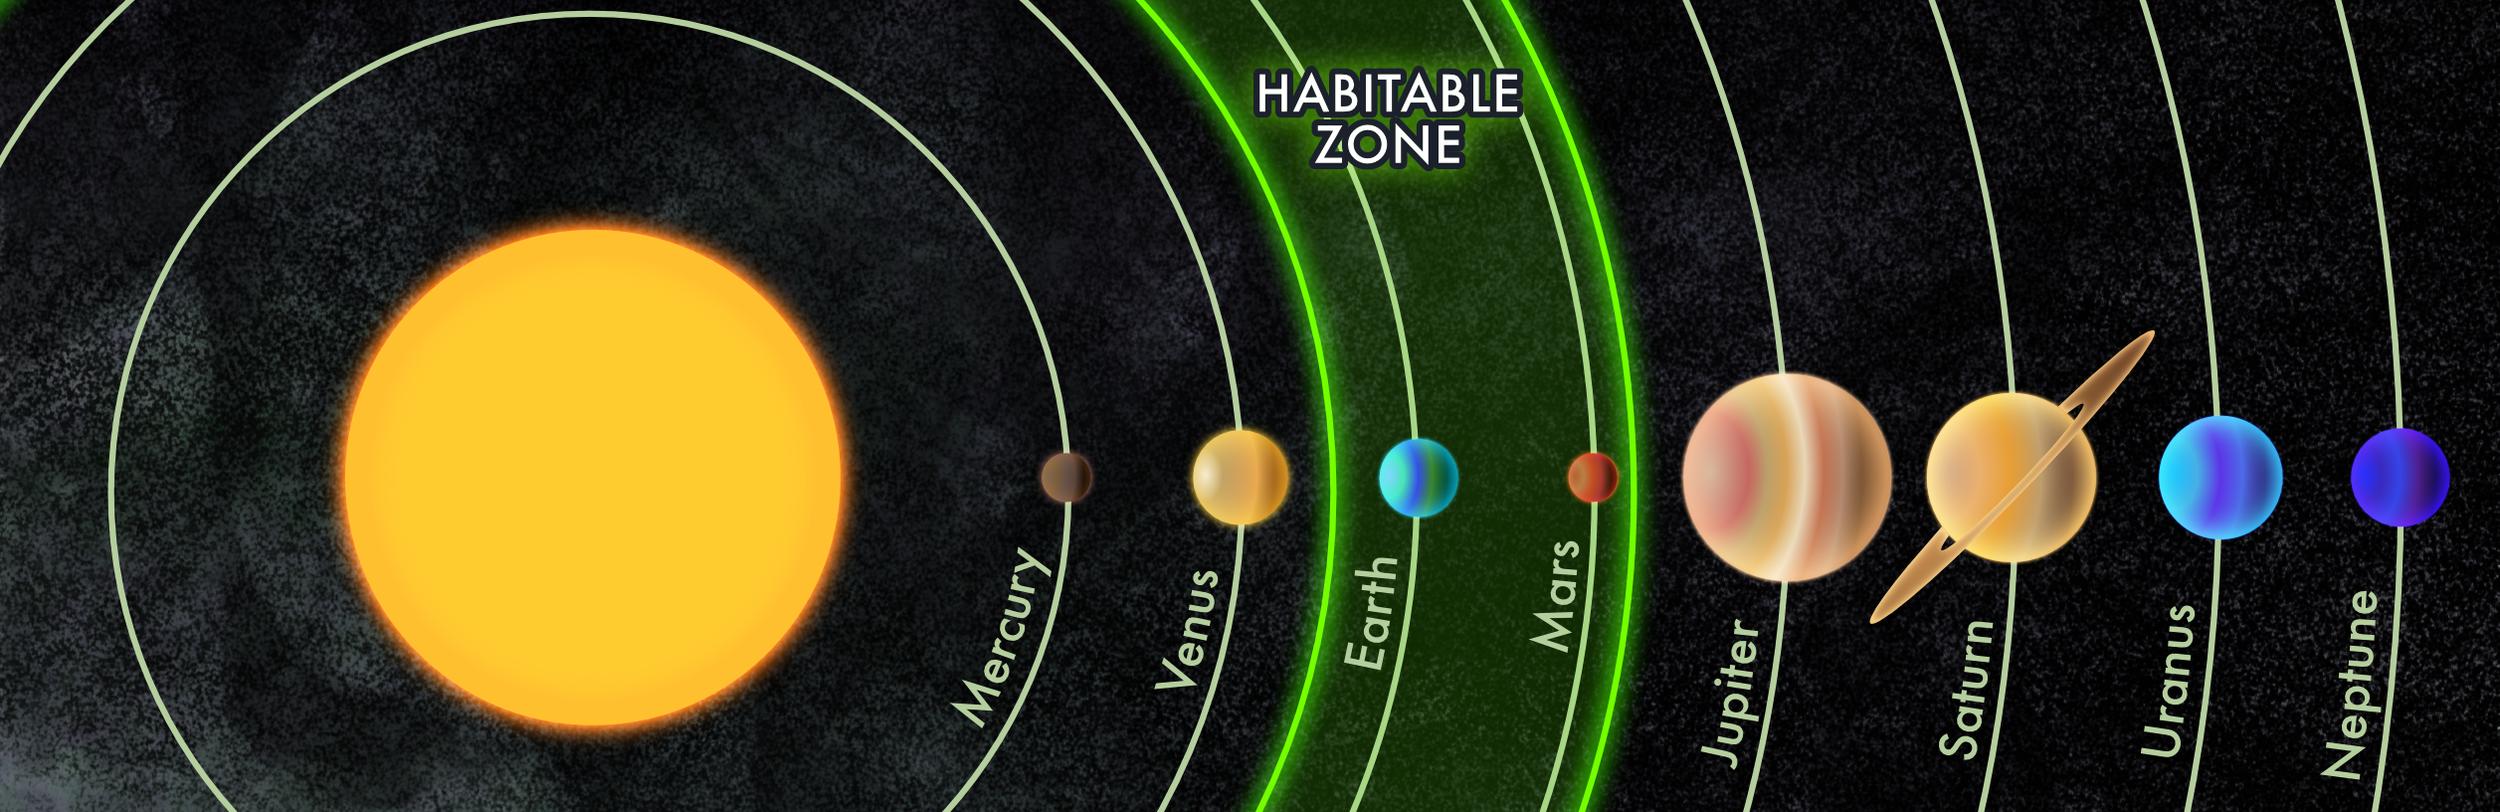 abassett_exoplanet2C.png